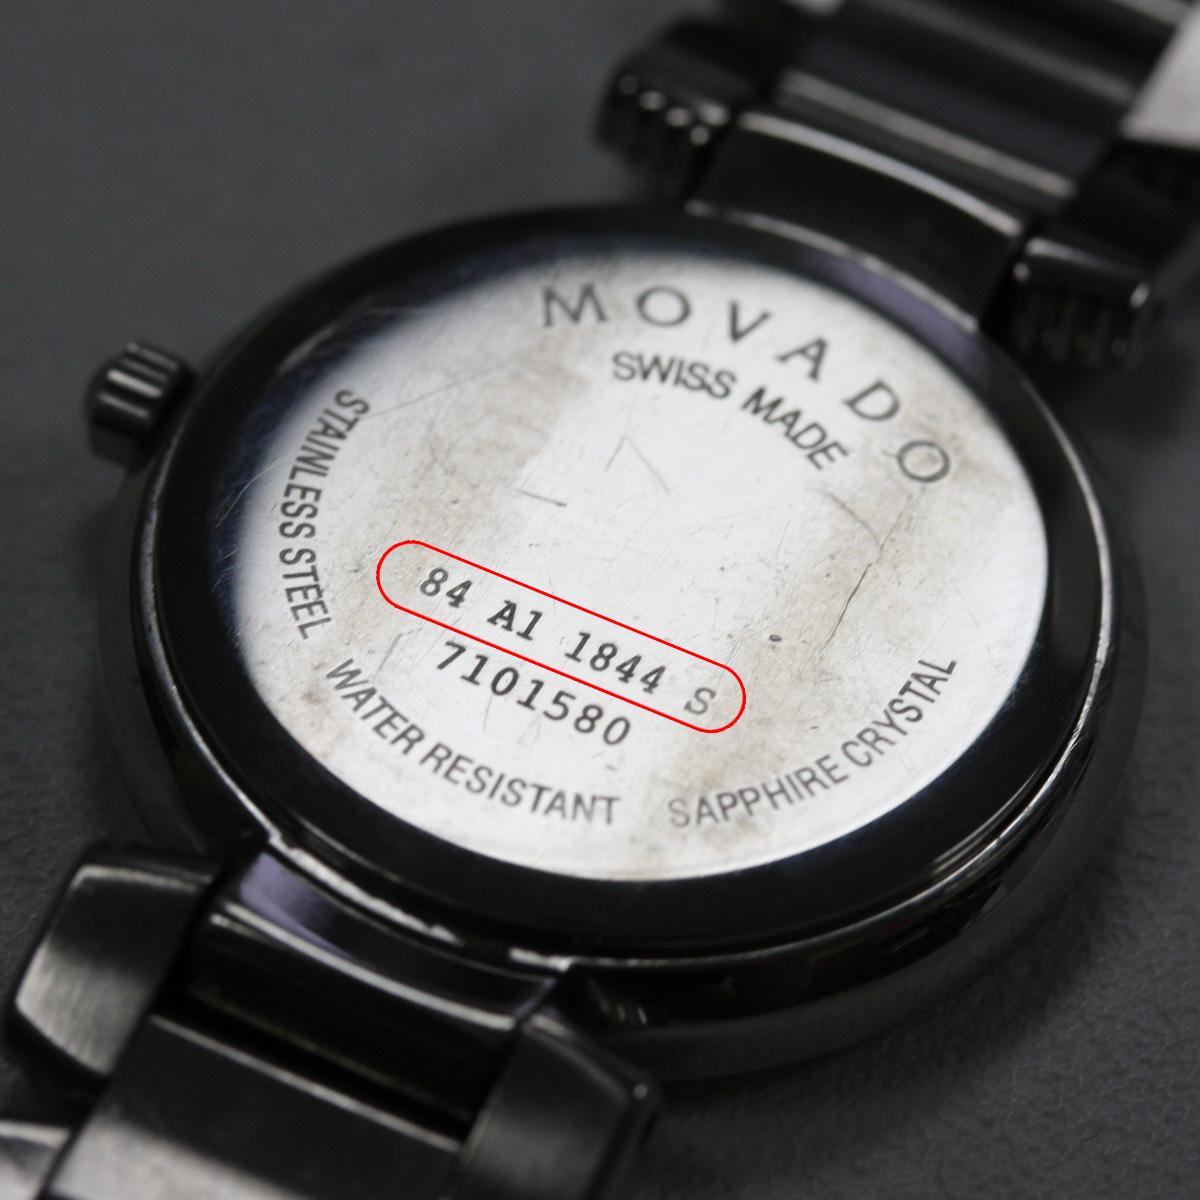 rado watch serial number verification